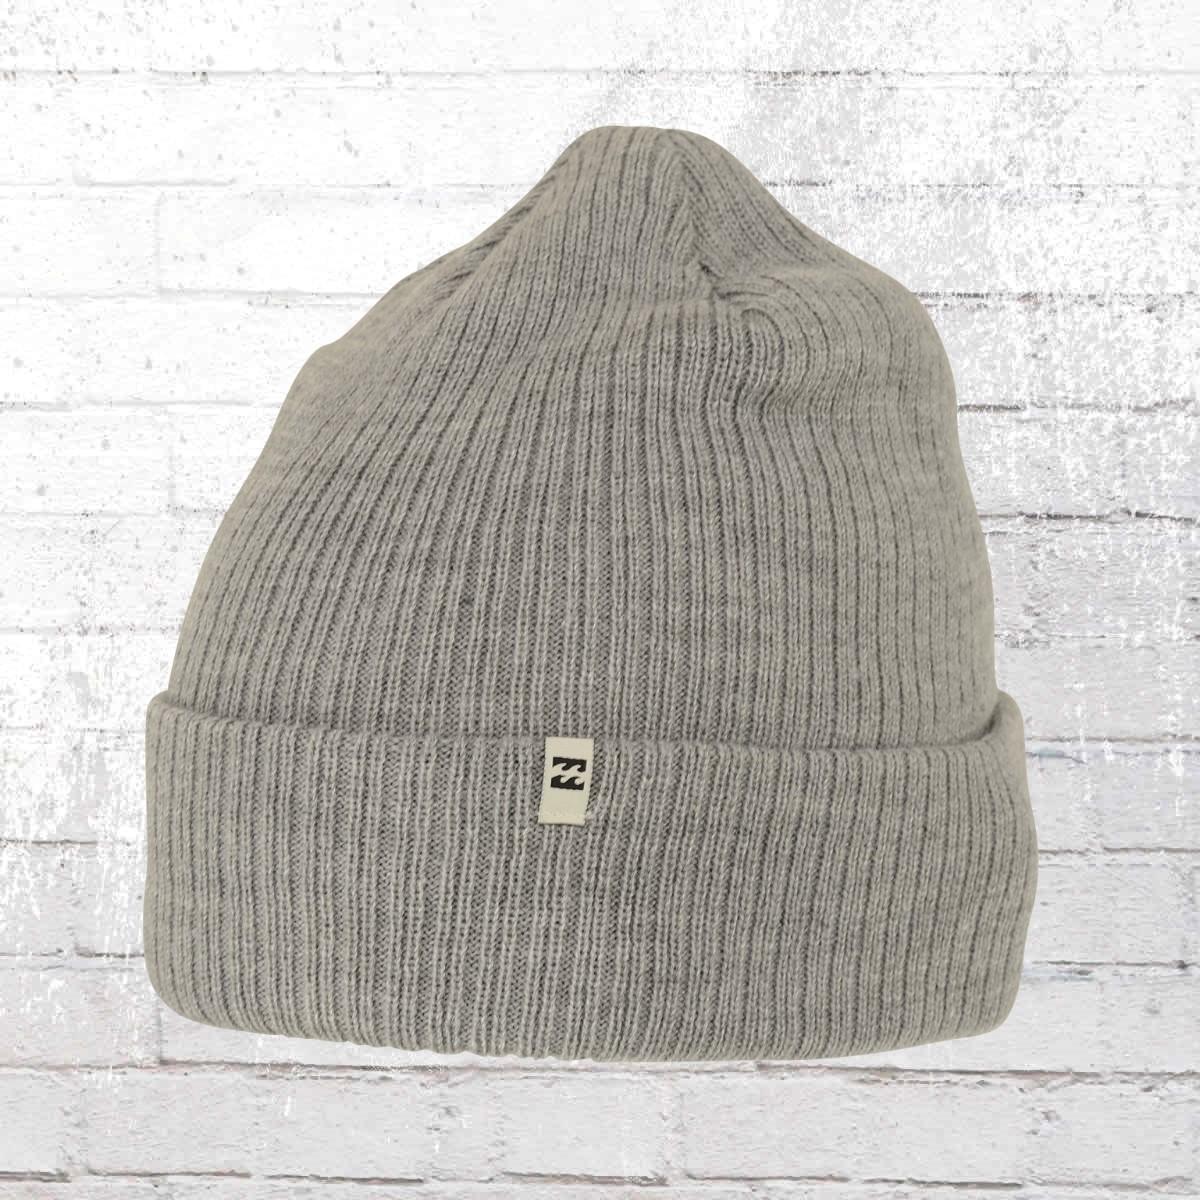 faab864cd14 Billabong Beanie Arcade Knit Hat grey marl. ›‹ «